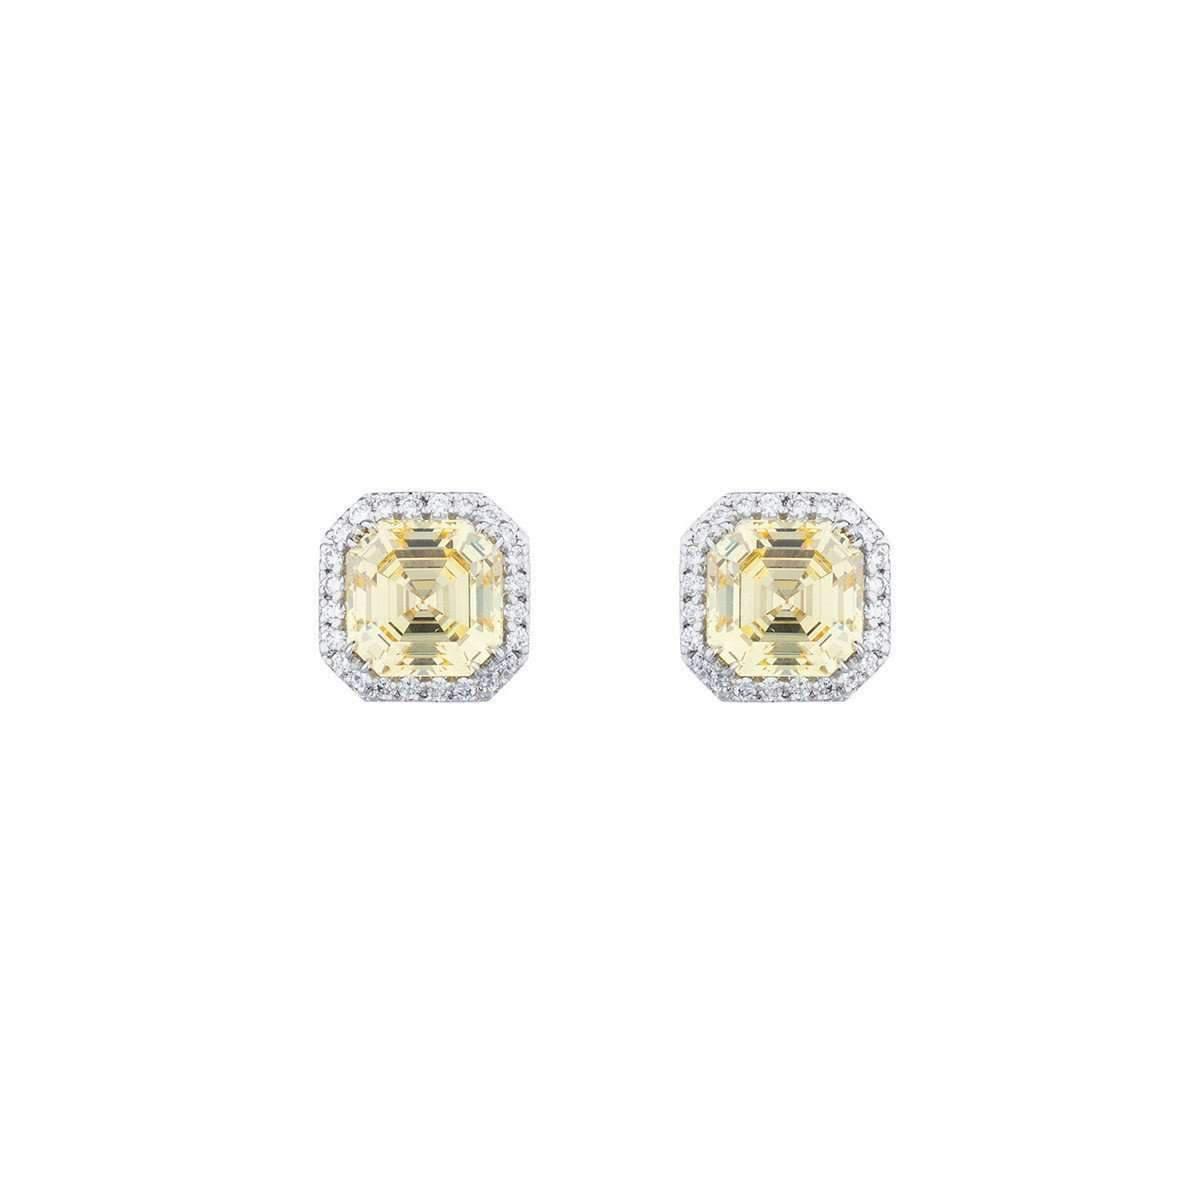 Fantasia Sterling Silver & Palladium Canary Teardrop Earrings snDhM4X